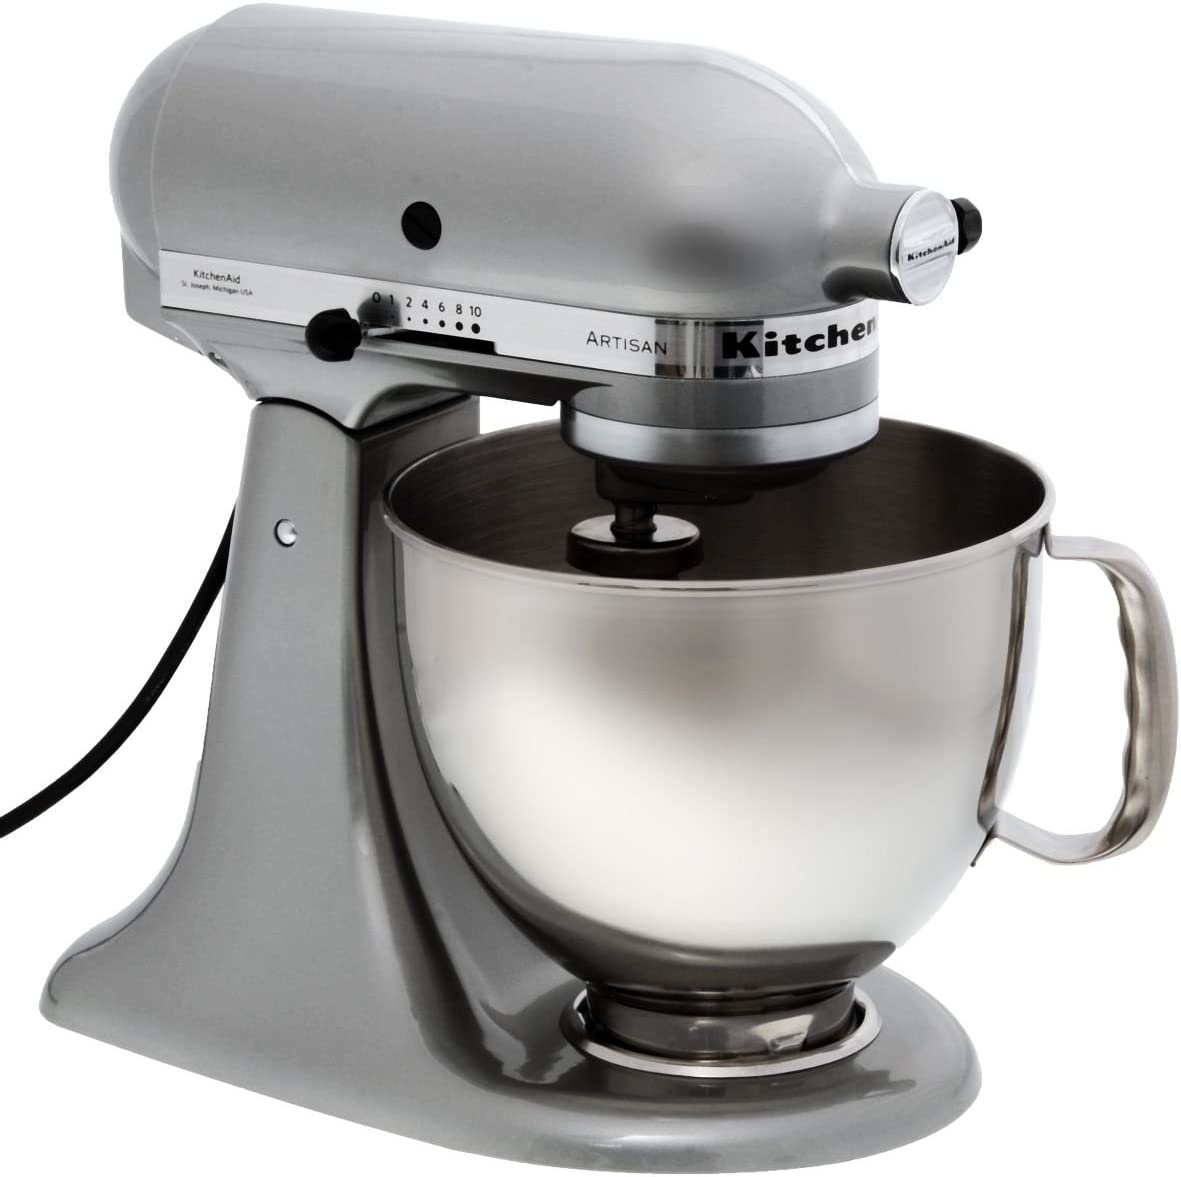 KitchenAid 5KSM150PSEMC Robot De Cocina, 300 W, Acero Inoxidable, 10 Velocidades, Cromo: Amazon.es: Hogar